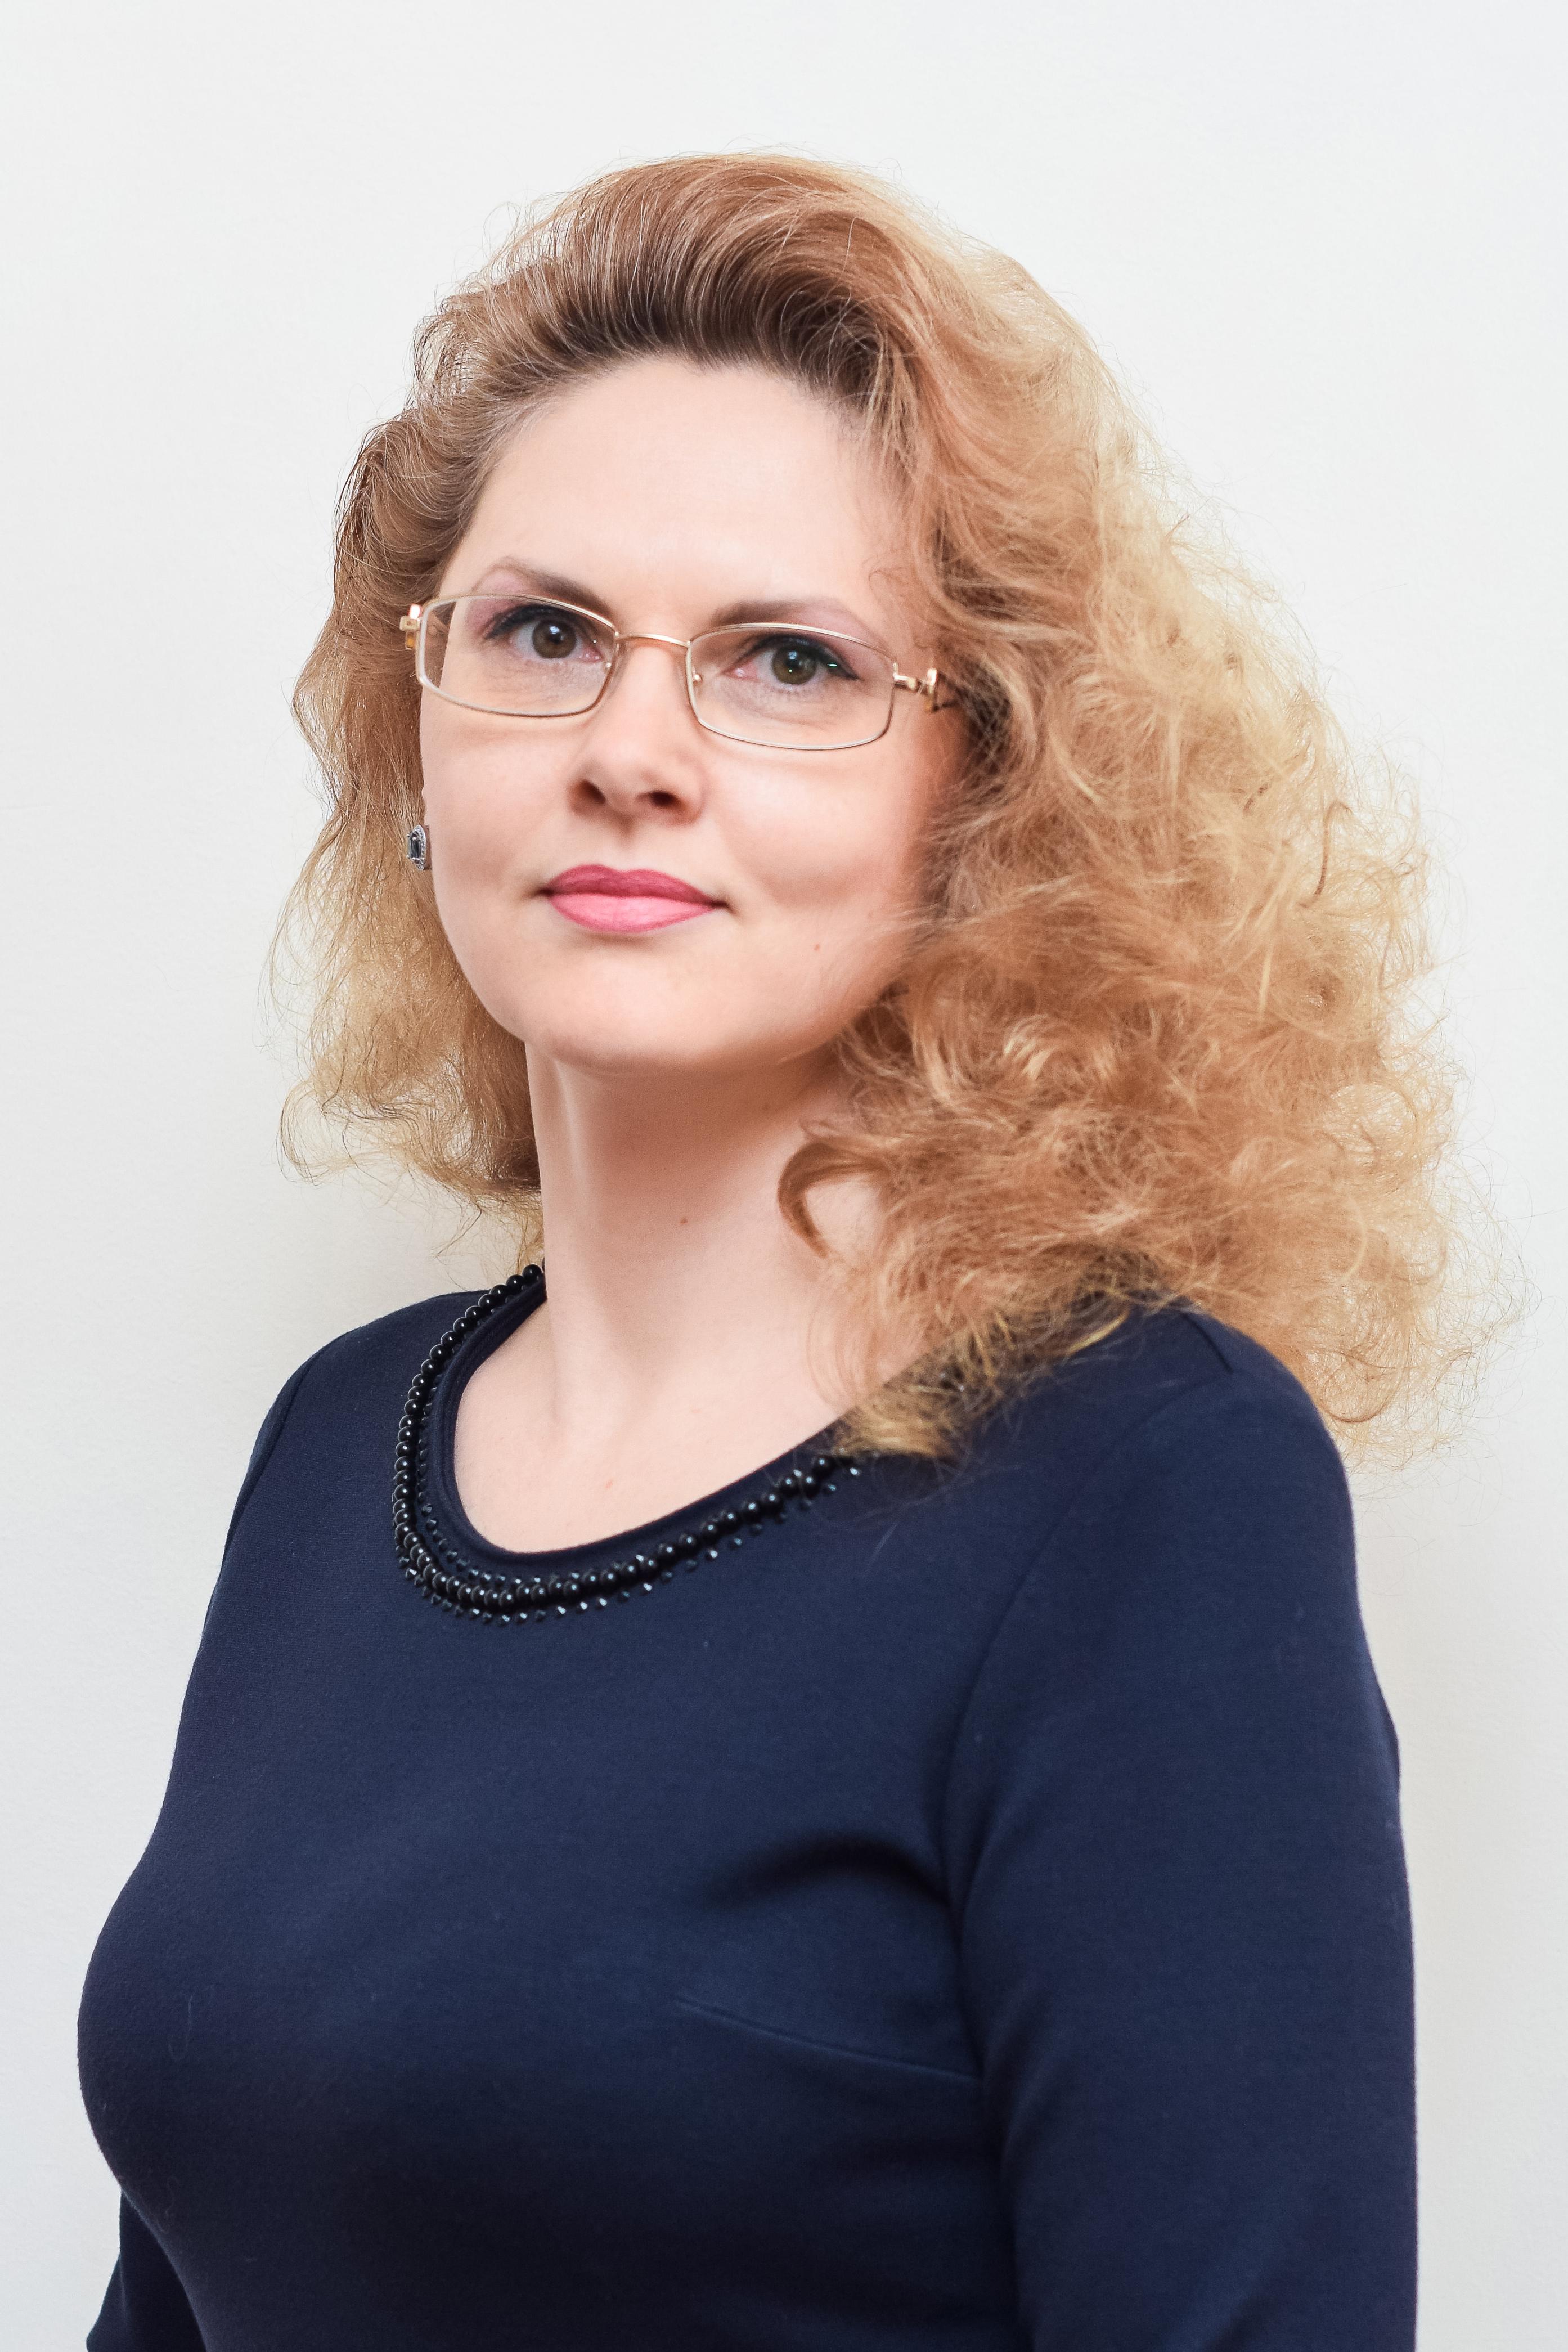 Розуменко Світлана Миколаївна